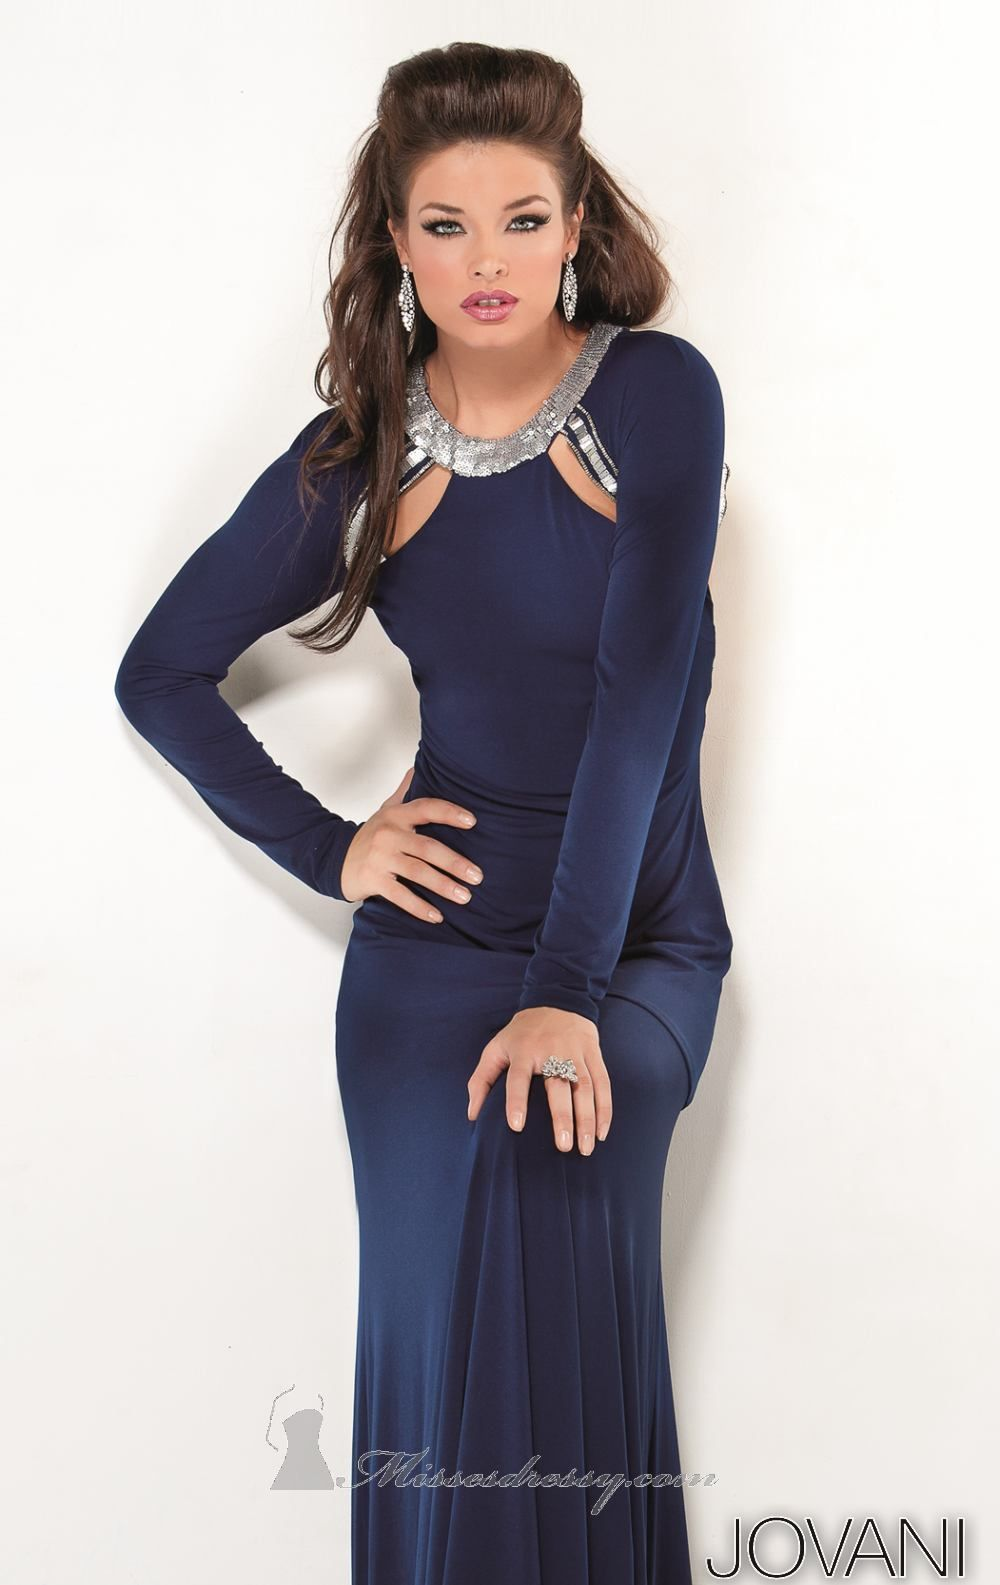 jovni dress blue navy long sleeves